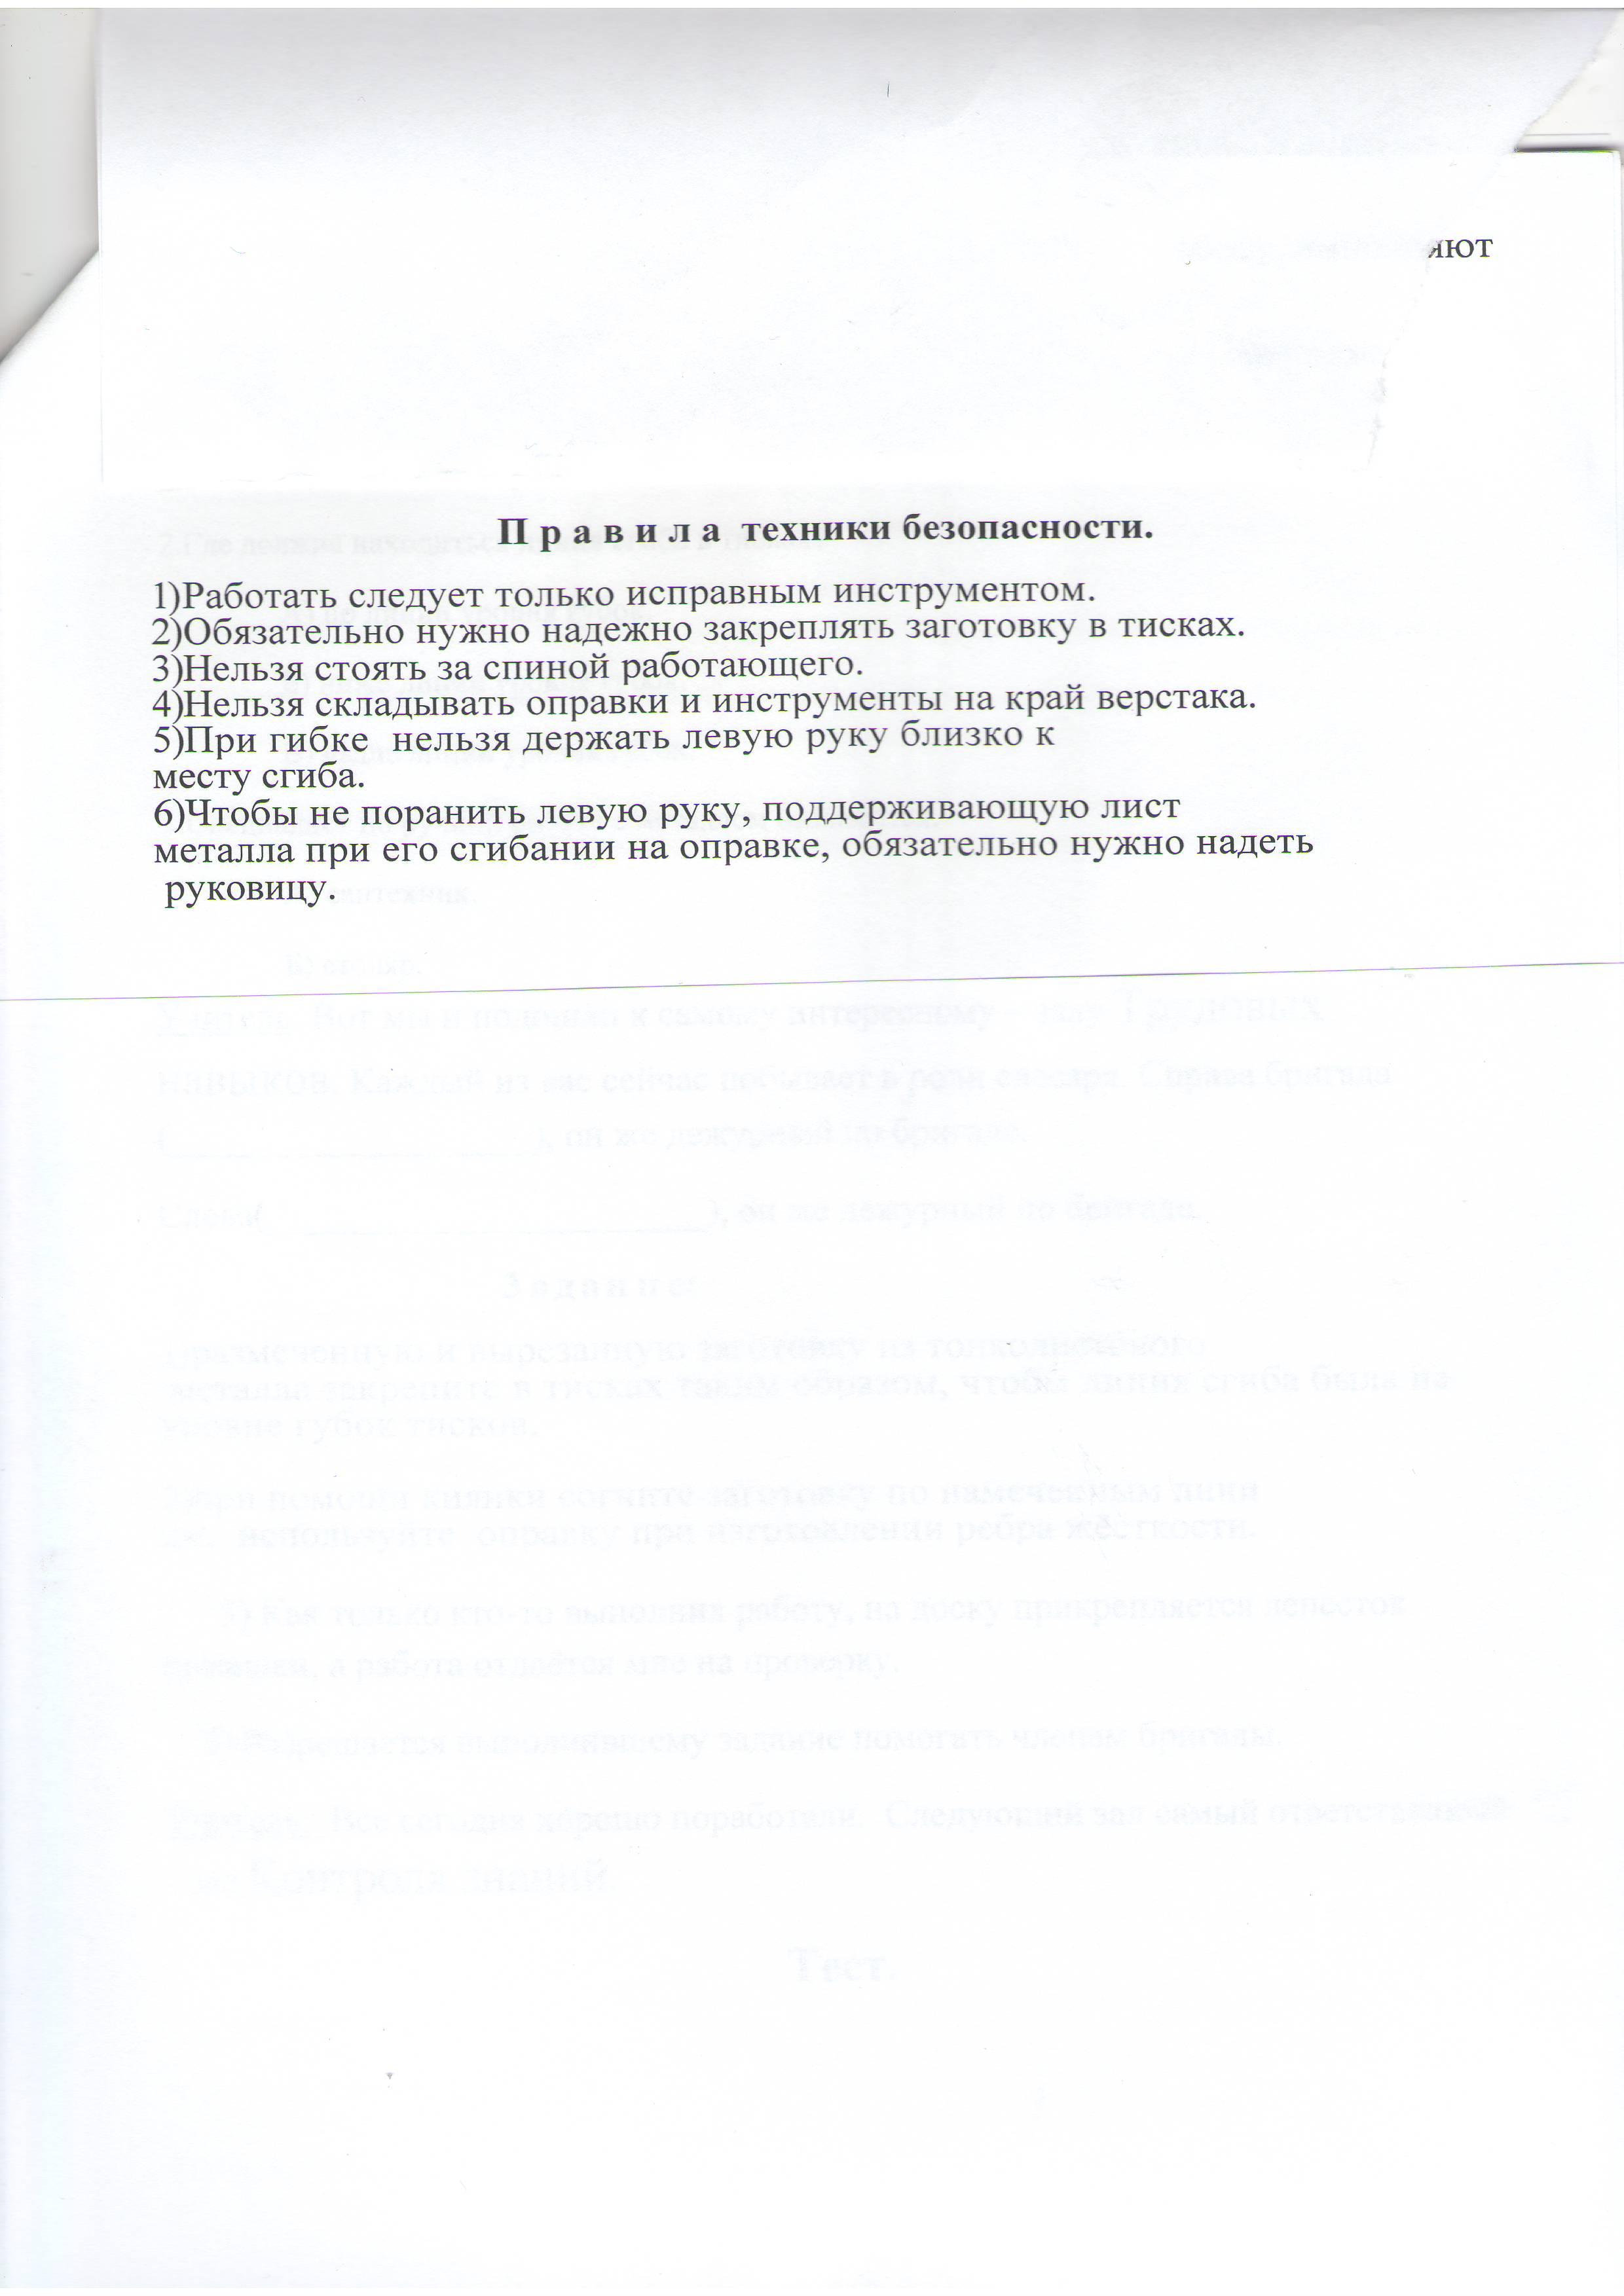 D:\Мои документы\Мои рисунки\2002-01-01\Изображение0002.JPG